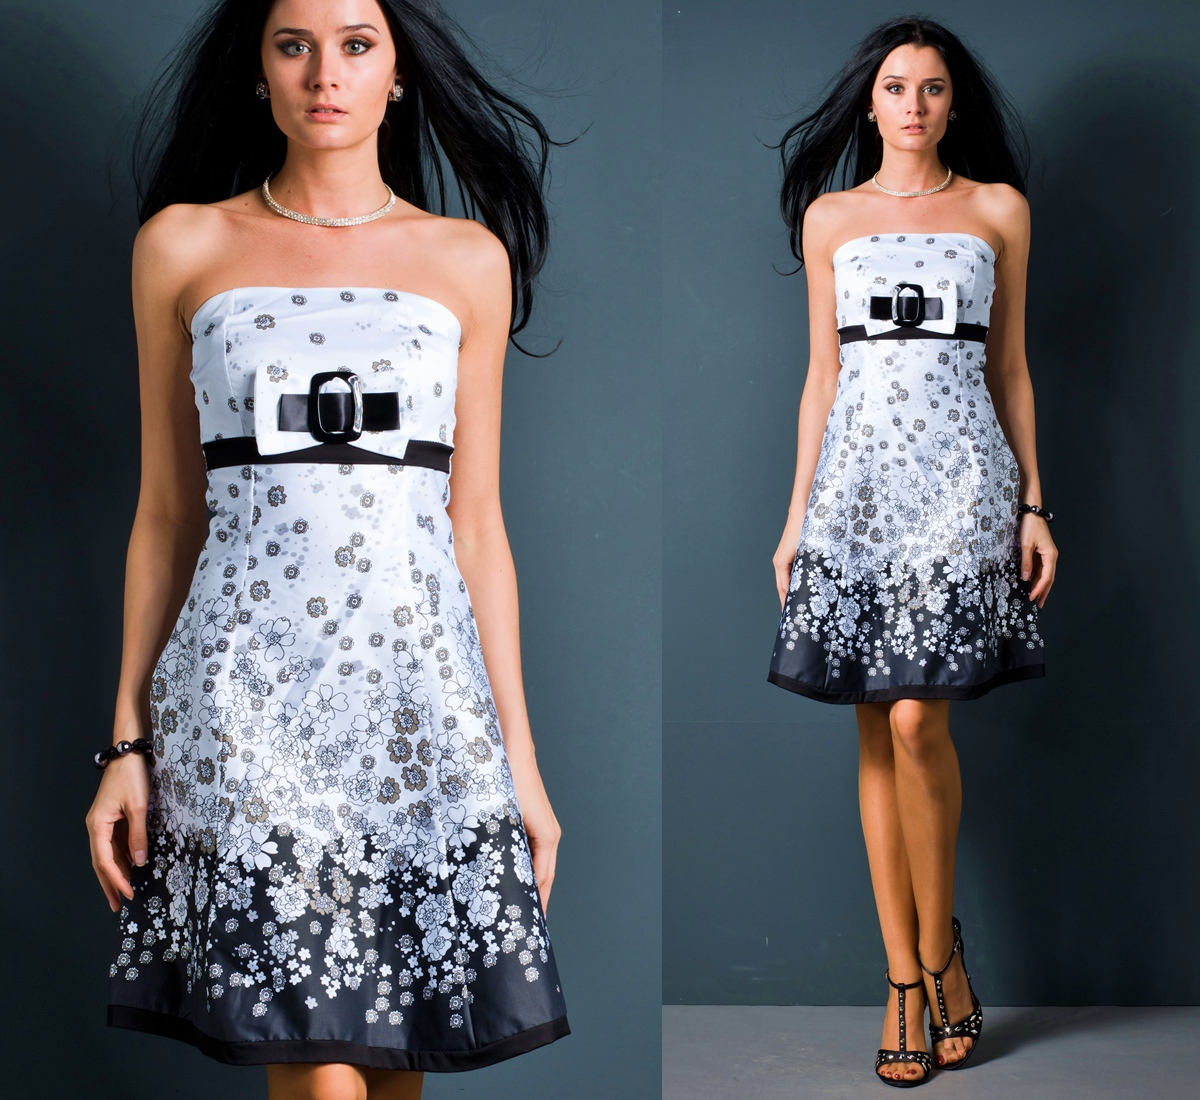 Kleid Minikleid Satin Schleife Bandeaukleid Babydoll Abendkleid ...